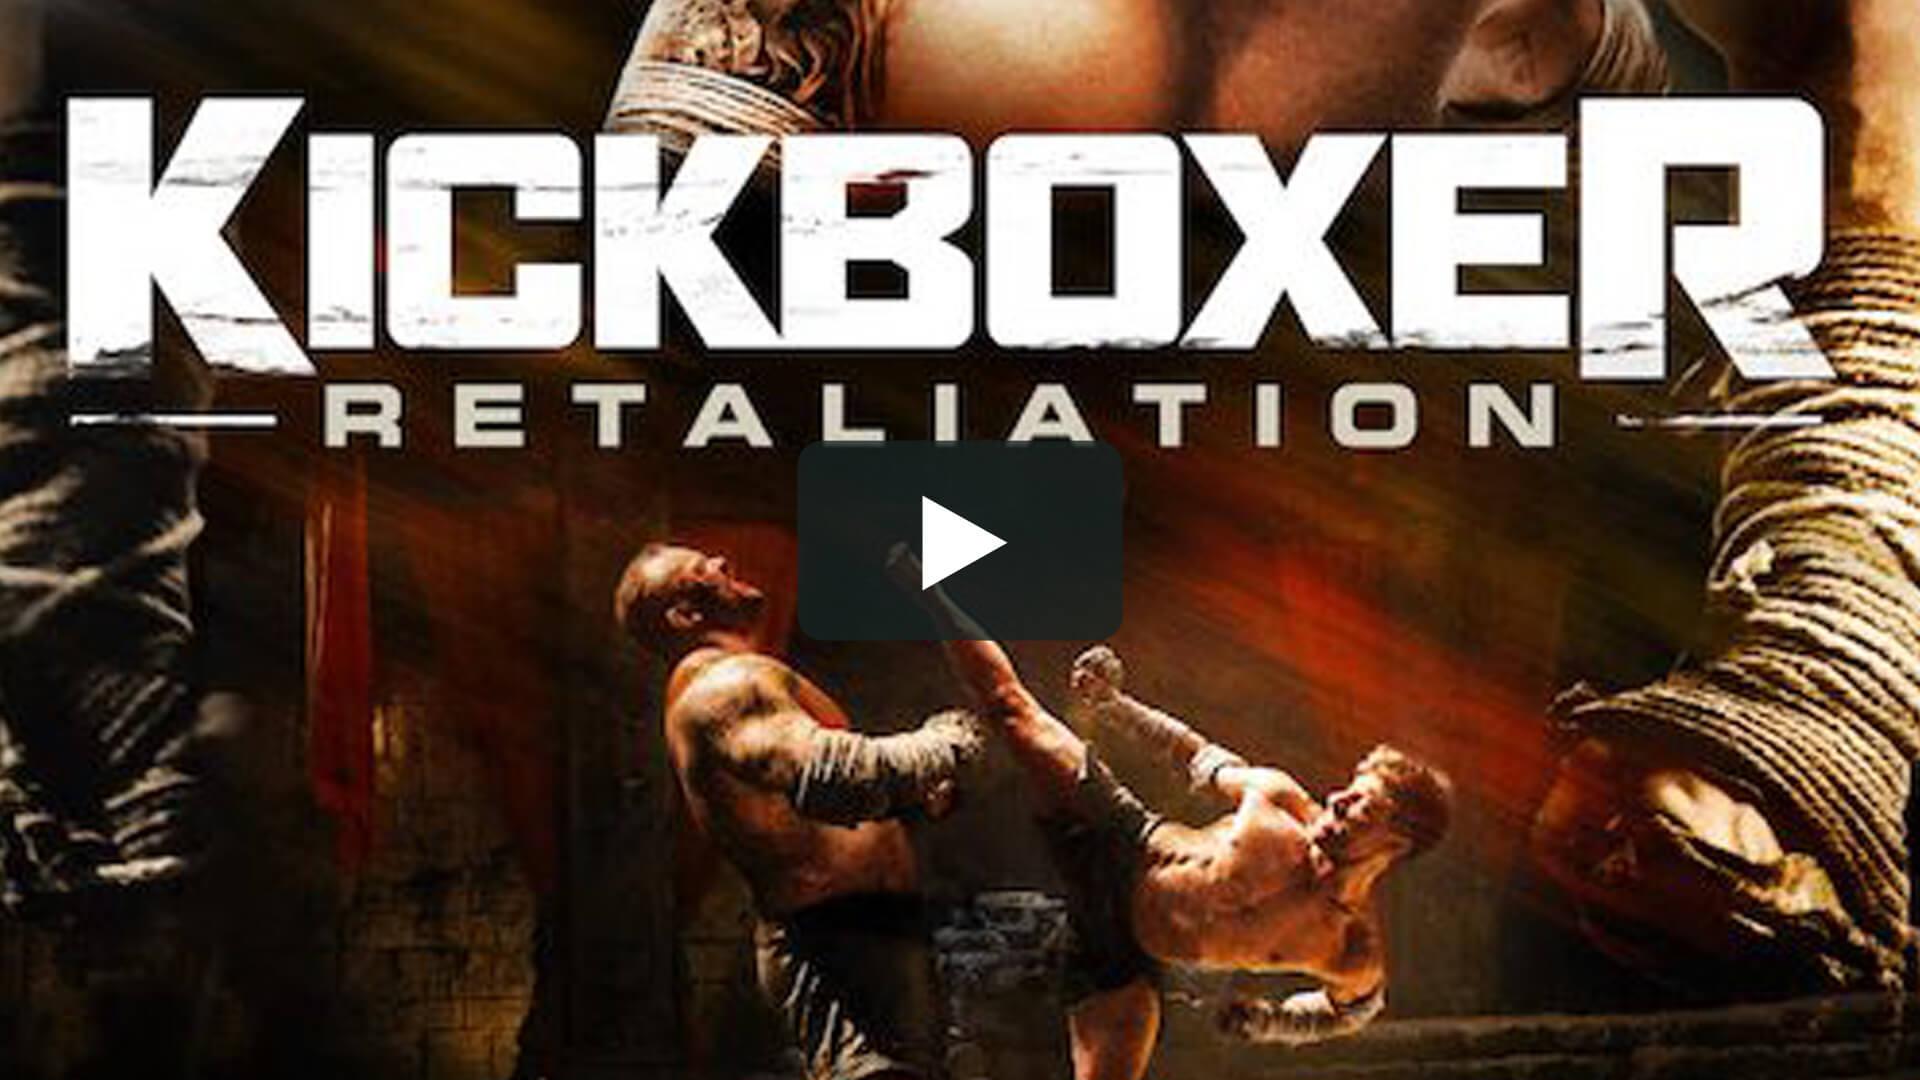 Kickboxer Retaliation - 搏擊之王:反擊